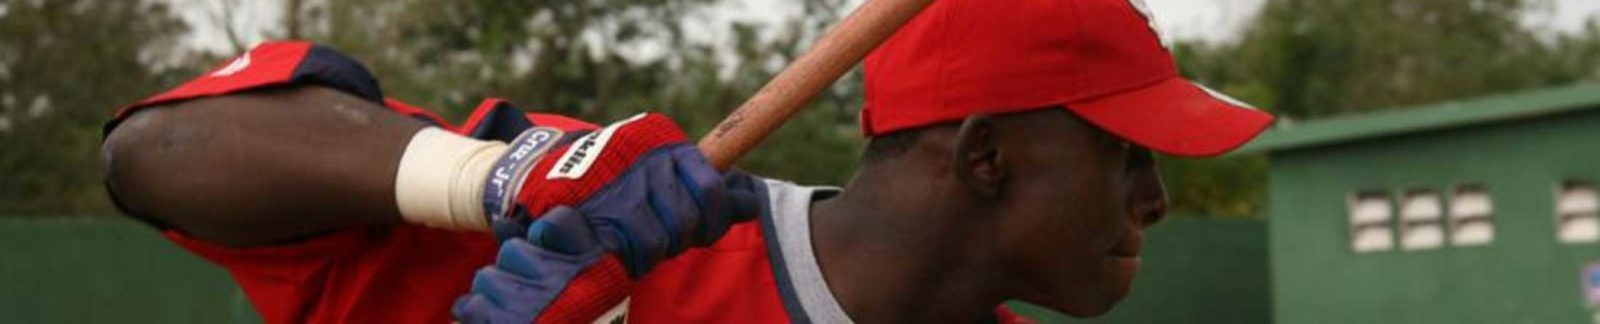 Ballplayer: Pelotero - header